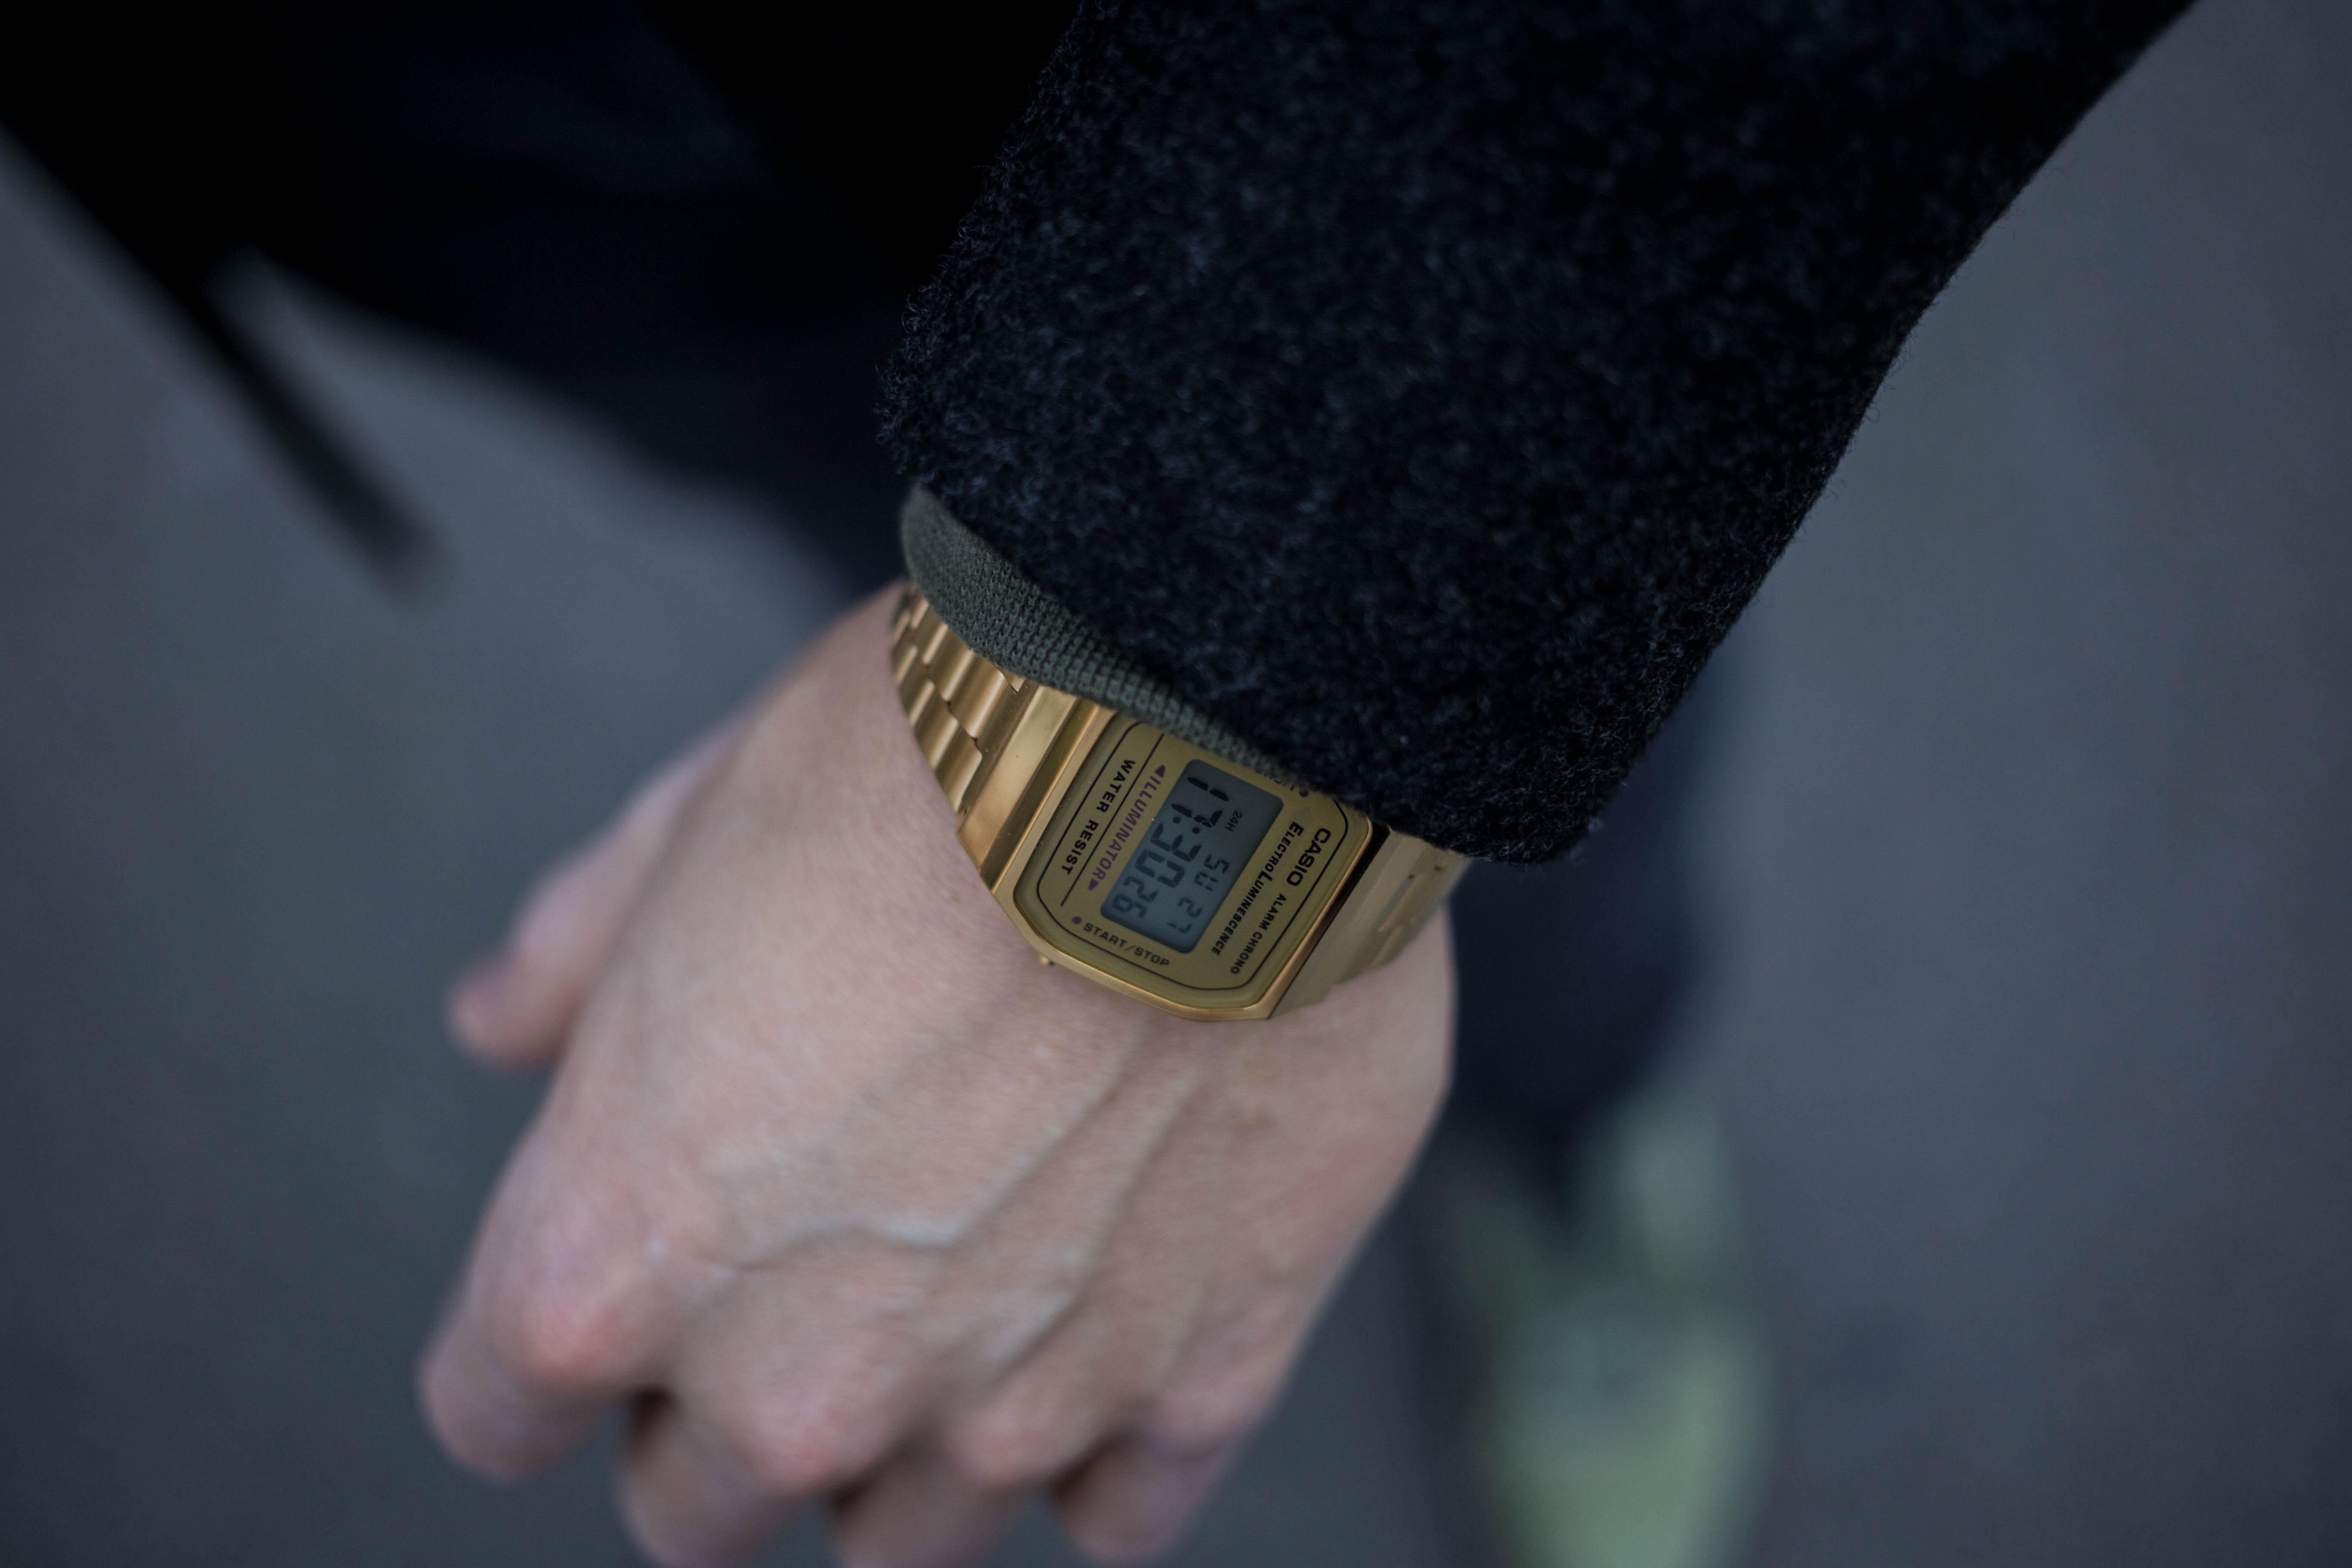 gruener-sweater-gruene-sneaker-modern-street-style-look-casio-uhr-modeblog-maennermode-berlin_8605